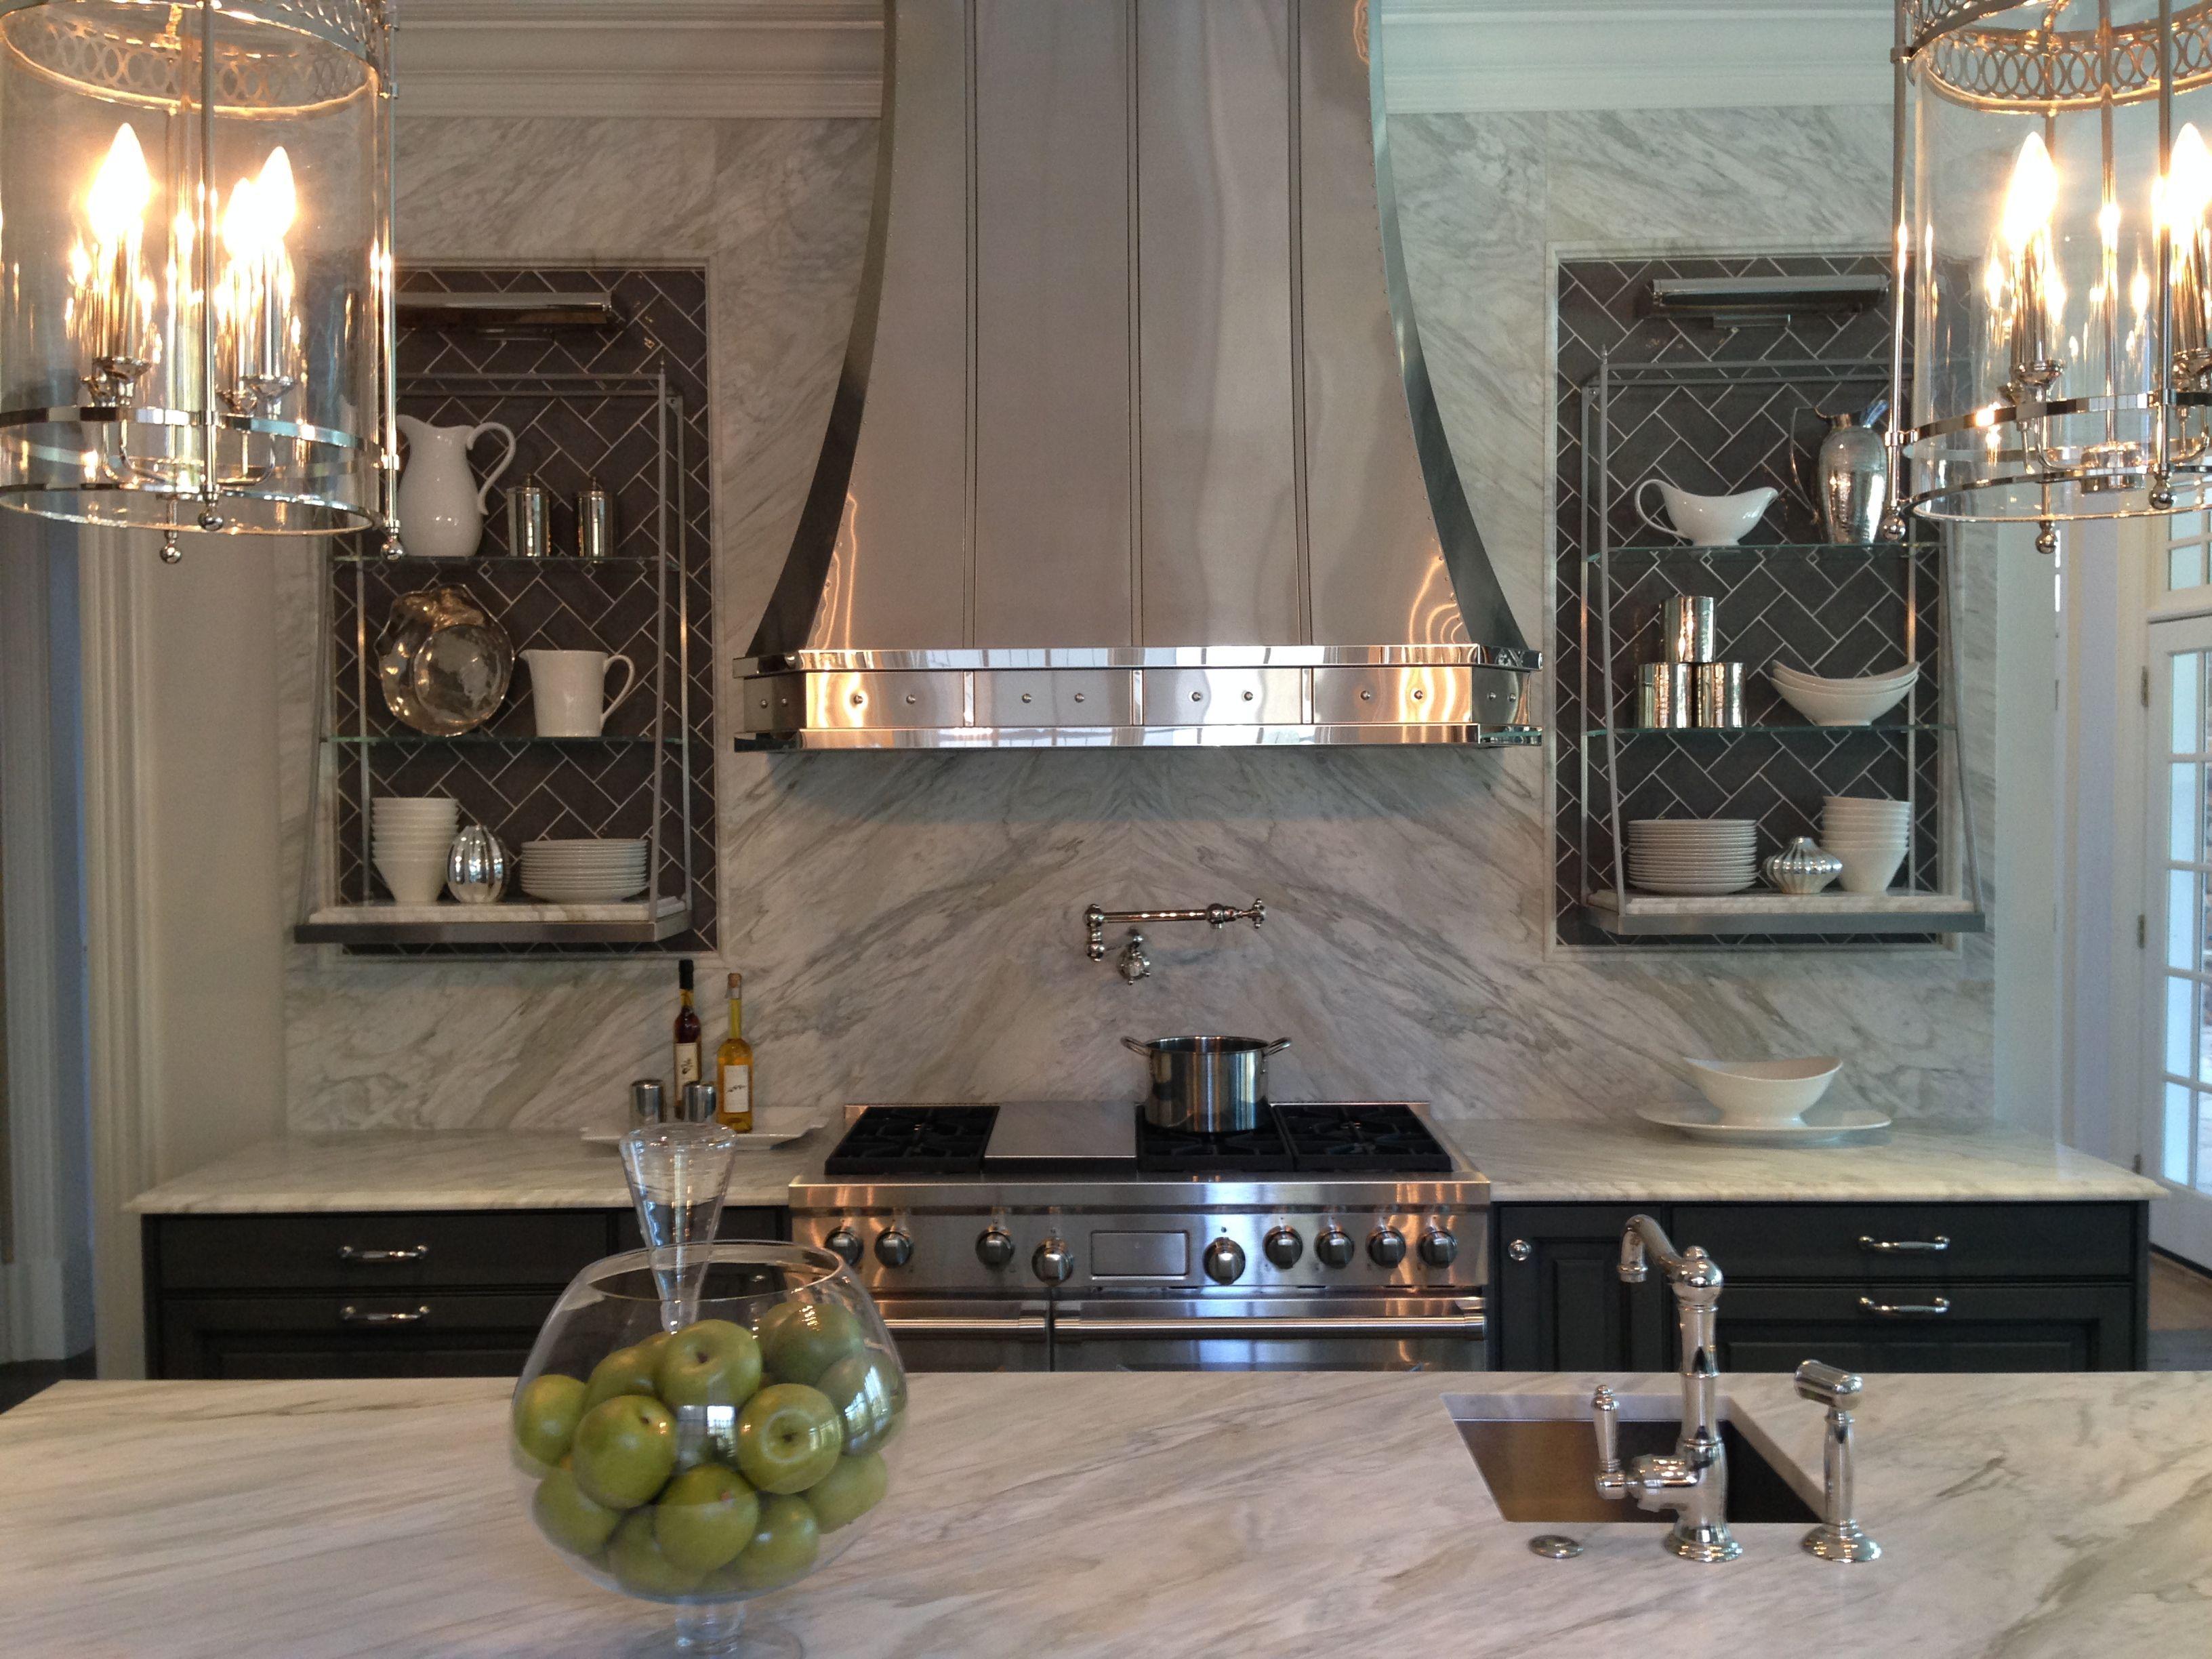 Wall Mounted Custom Range Hood In Mirrored Stainless Steel Zinc Range Hood Kitchen Hood Design Kitchen Hoods